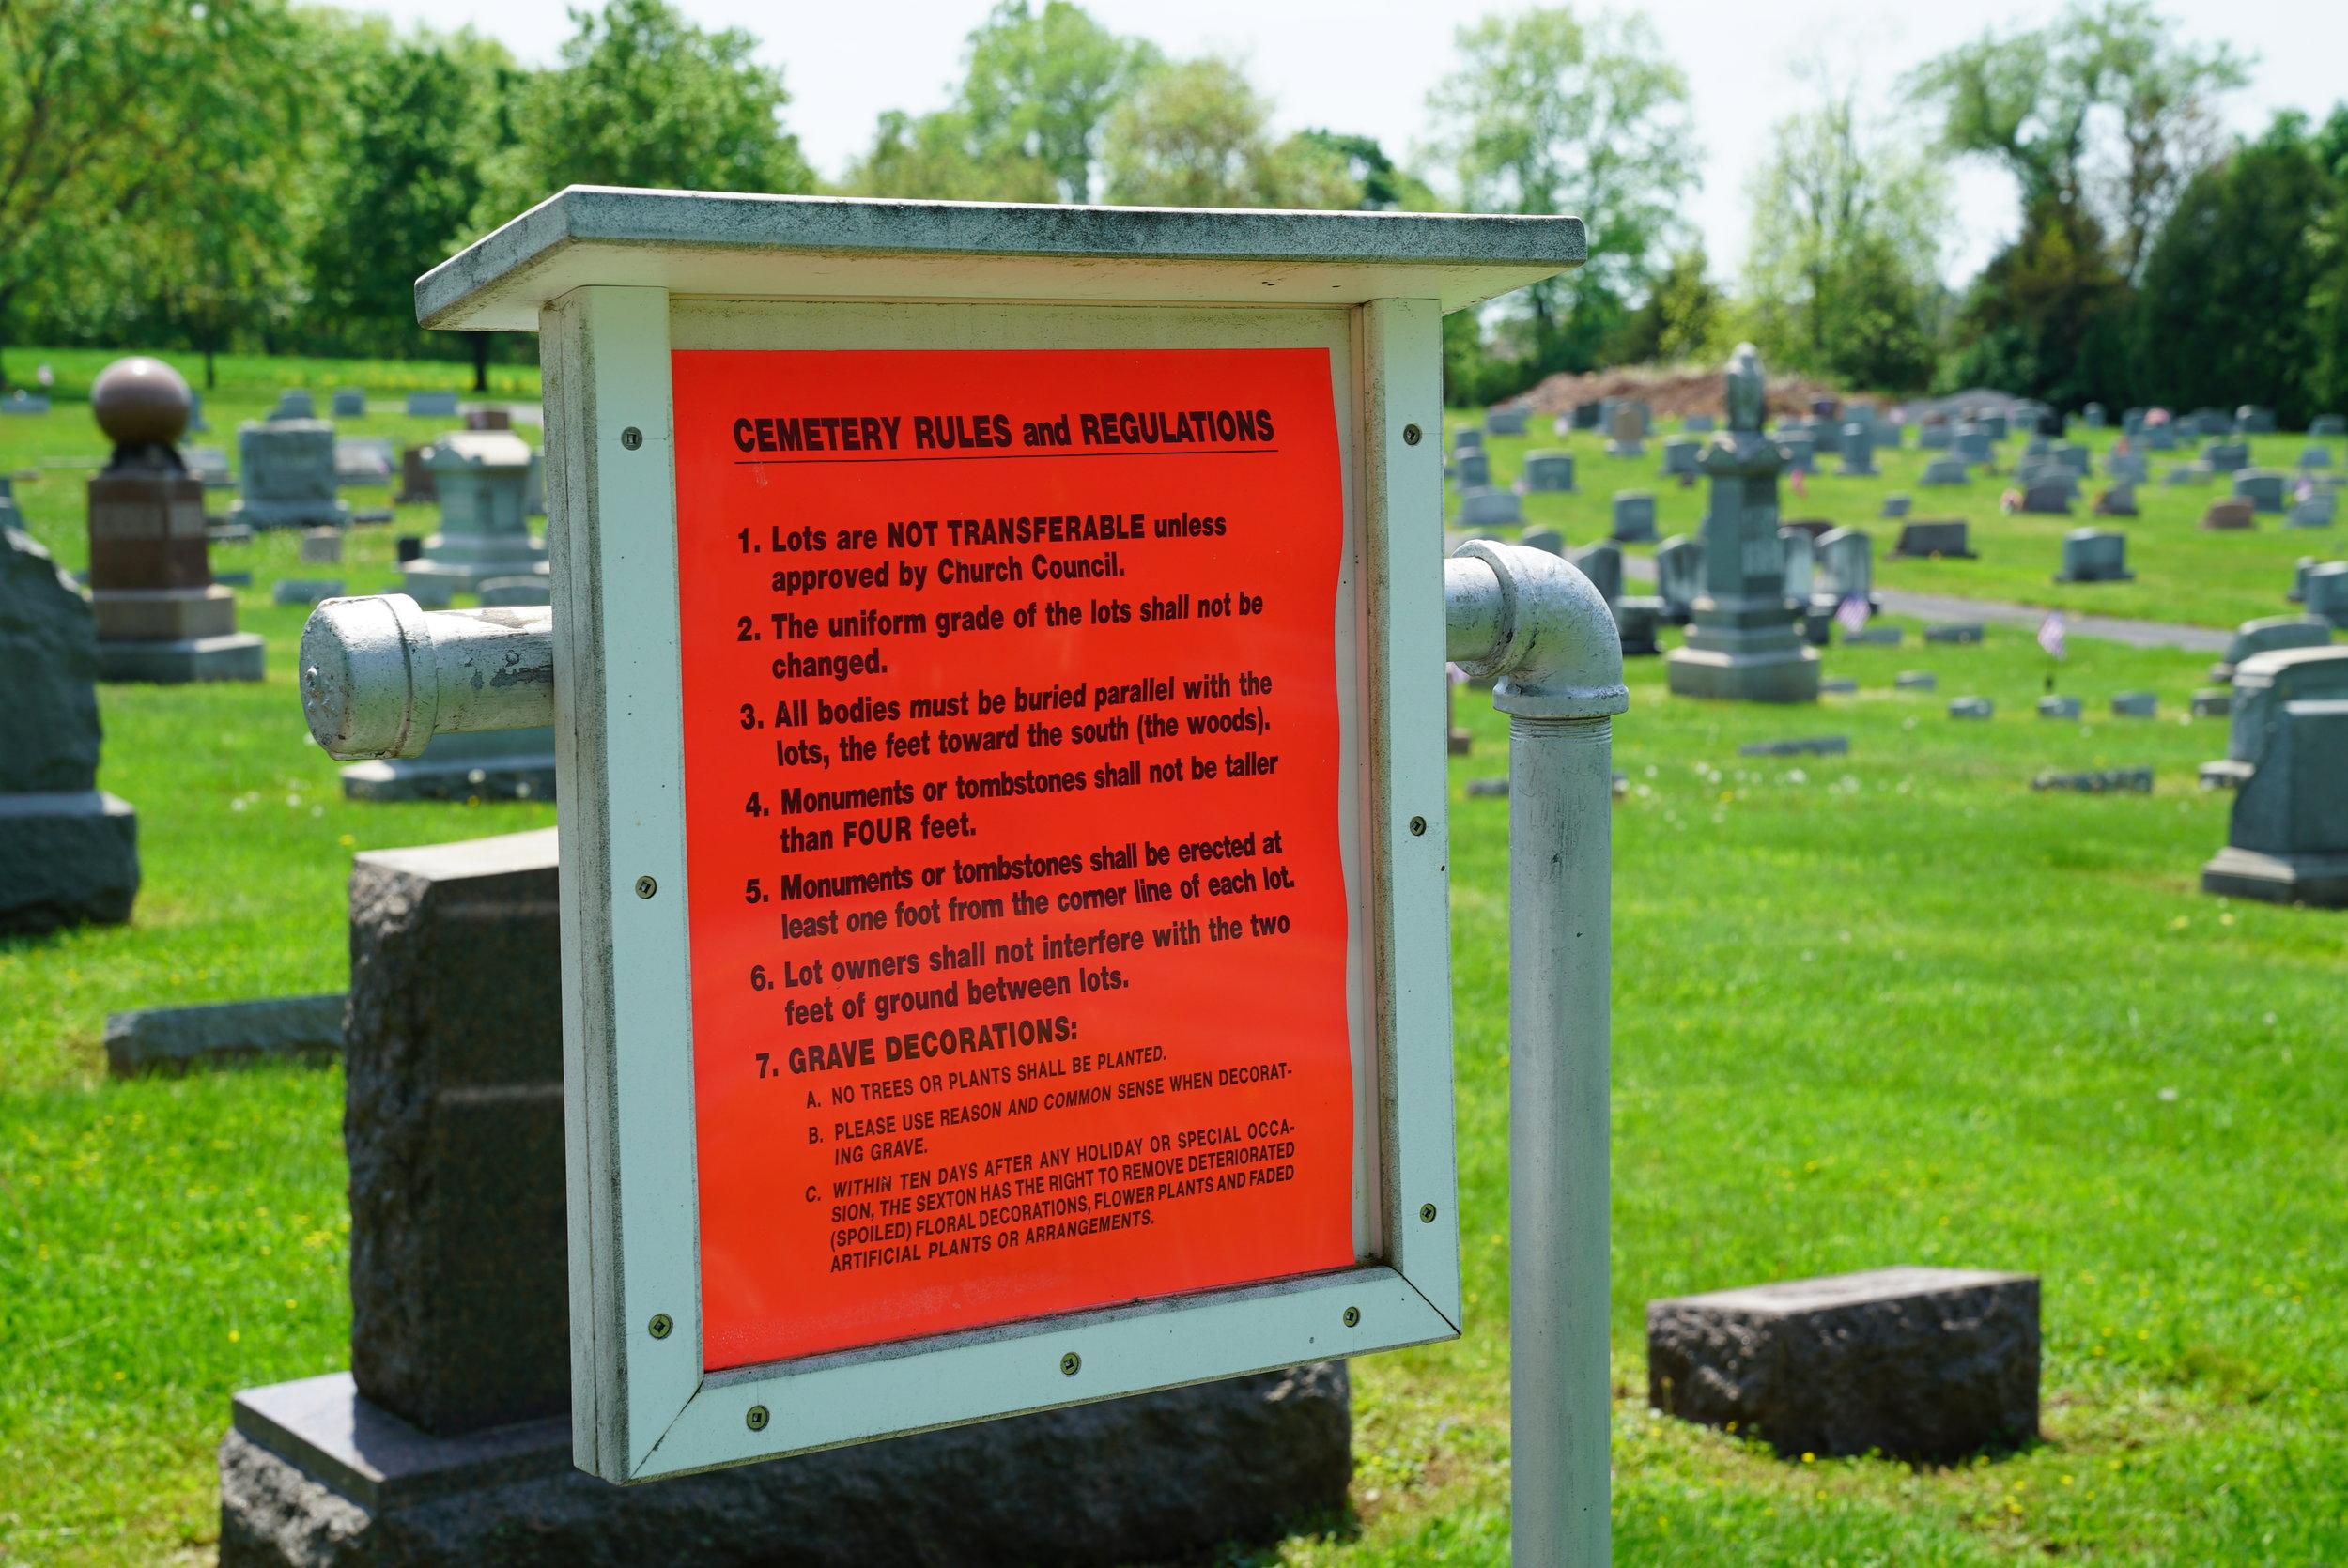 The rules. St. Paul's Lutheran Church Cemetery. Pennsburg area. Montgomery County, Pennsylvania.